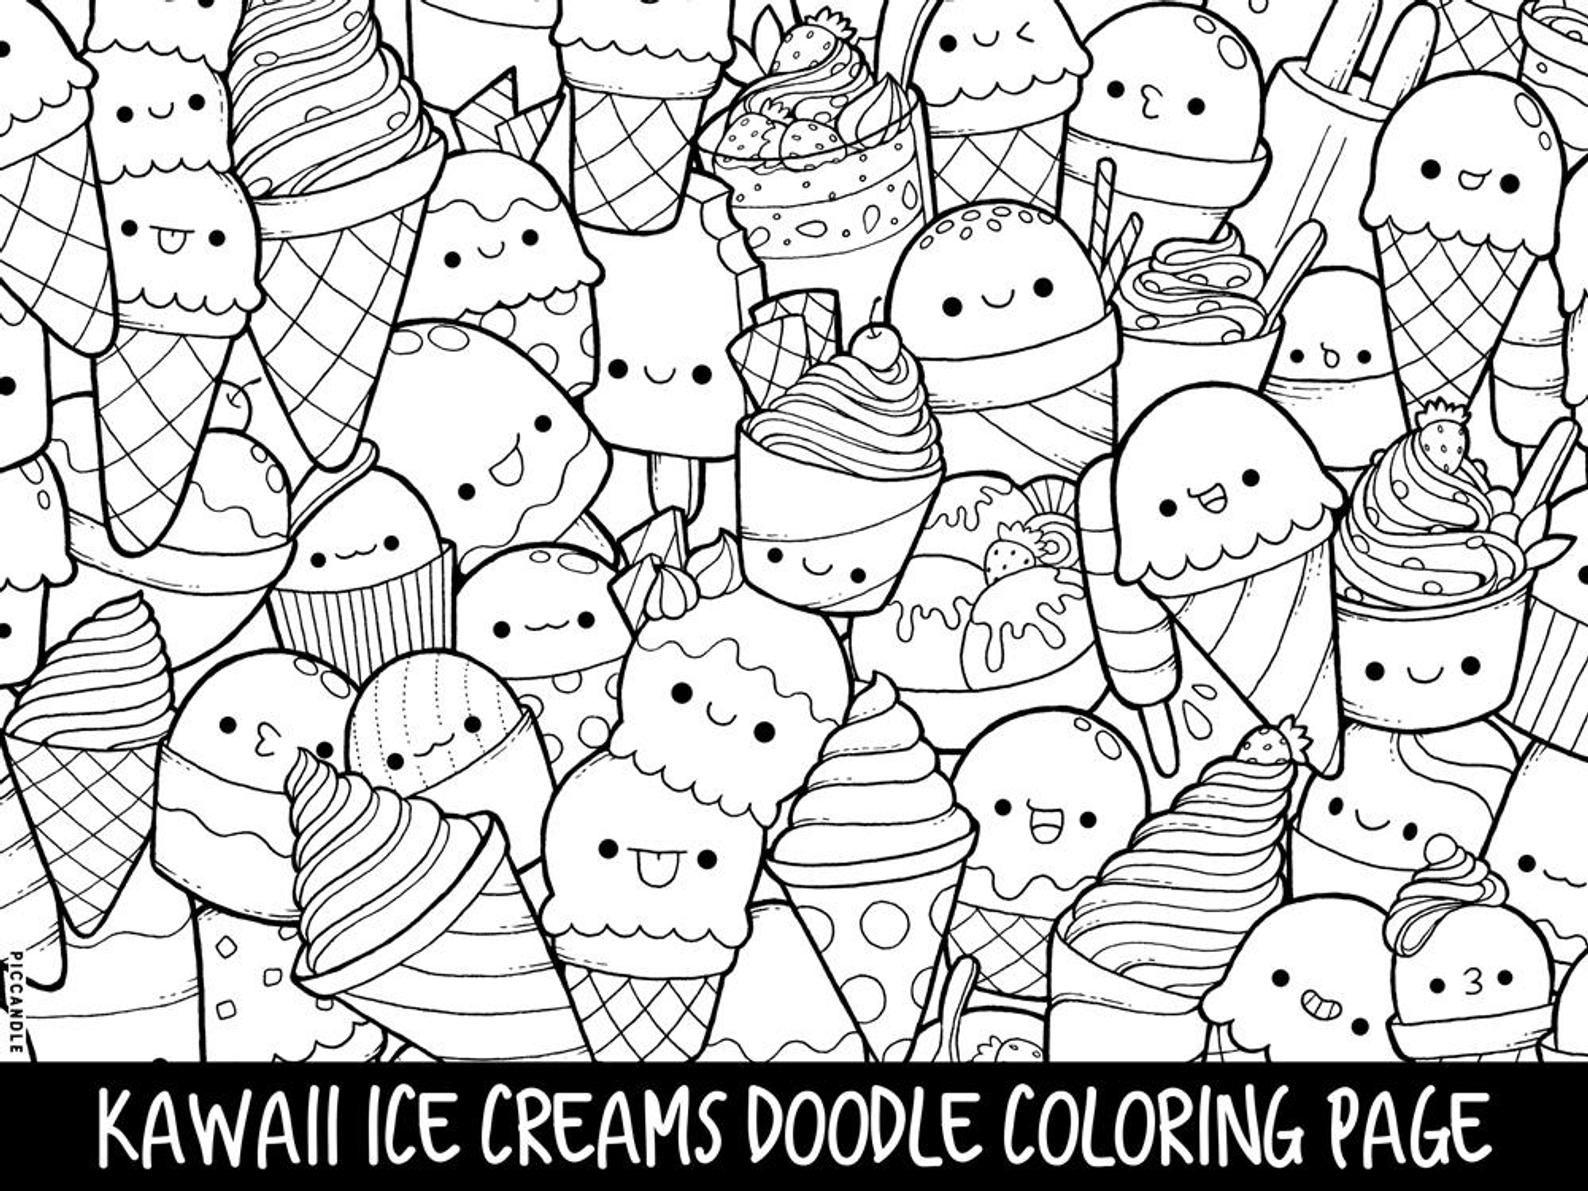 Ice Creams Doodle Coloring Page Printable  Cute/Kawaii Coloring